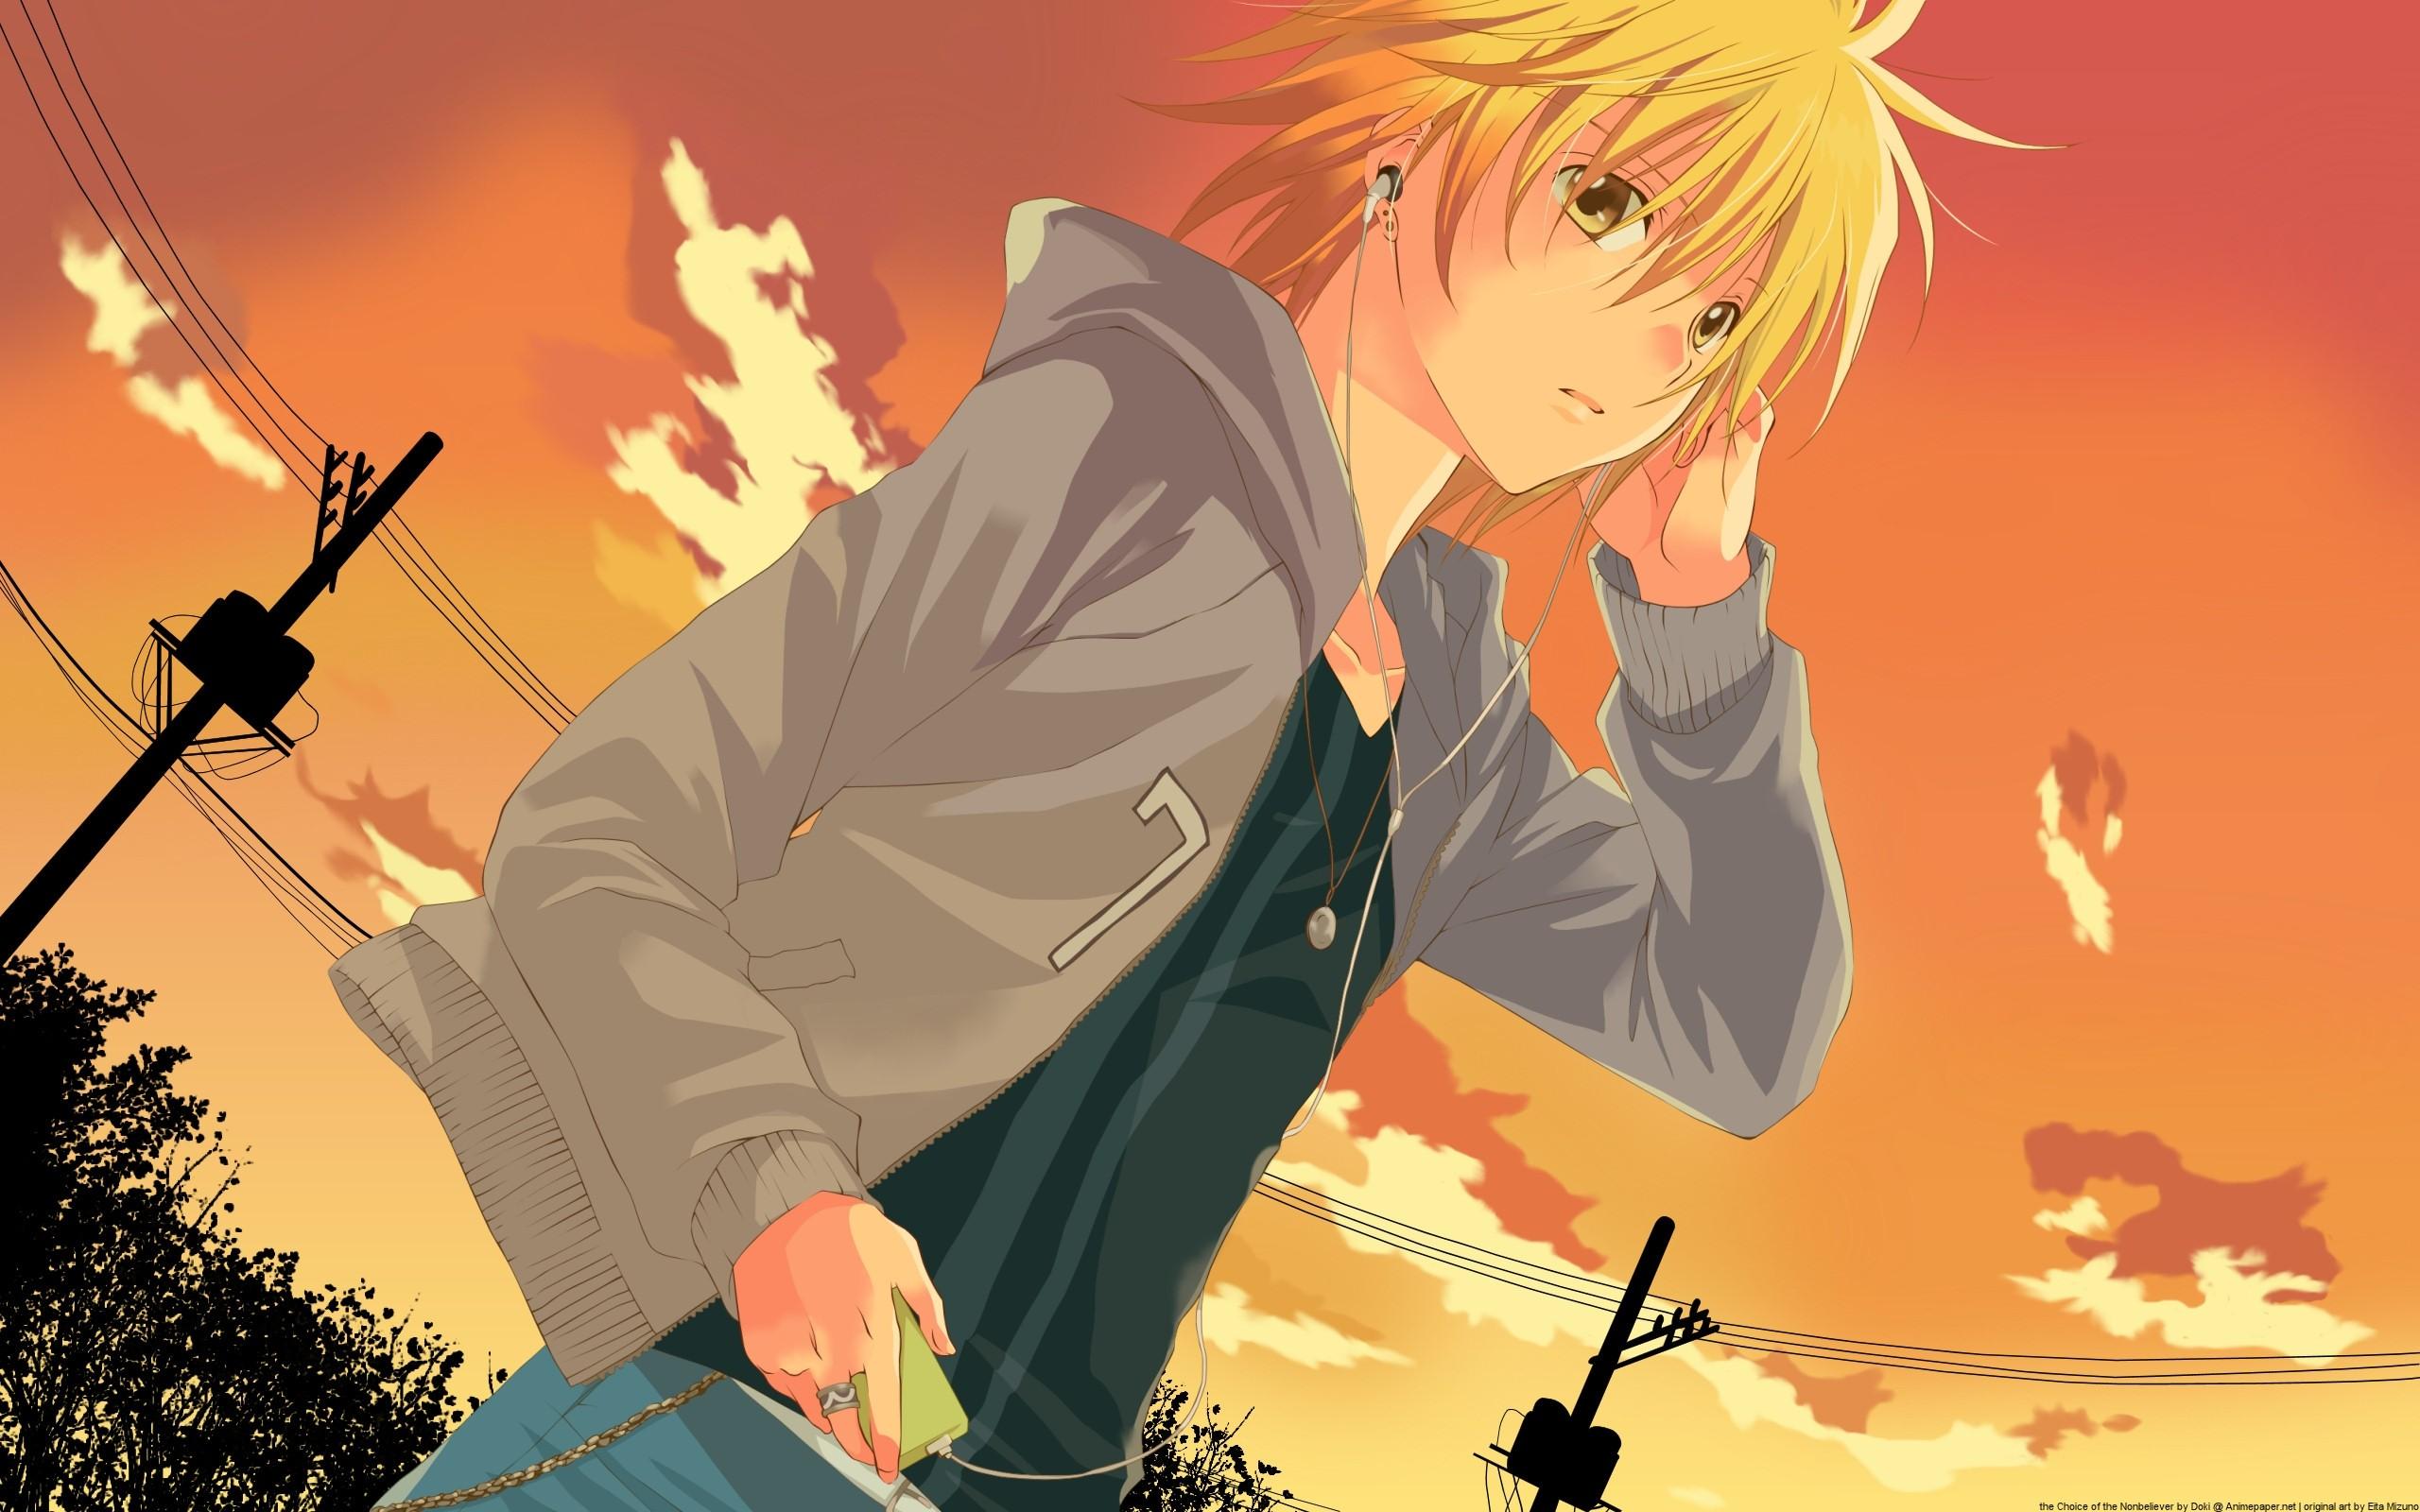 2560x1600 Cool Guy Anime Wallpaper 7 Desktop Background